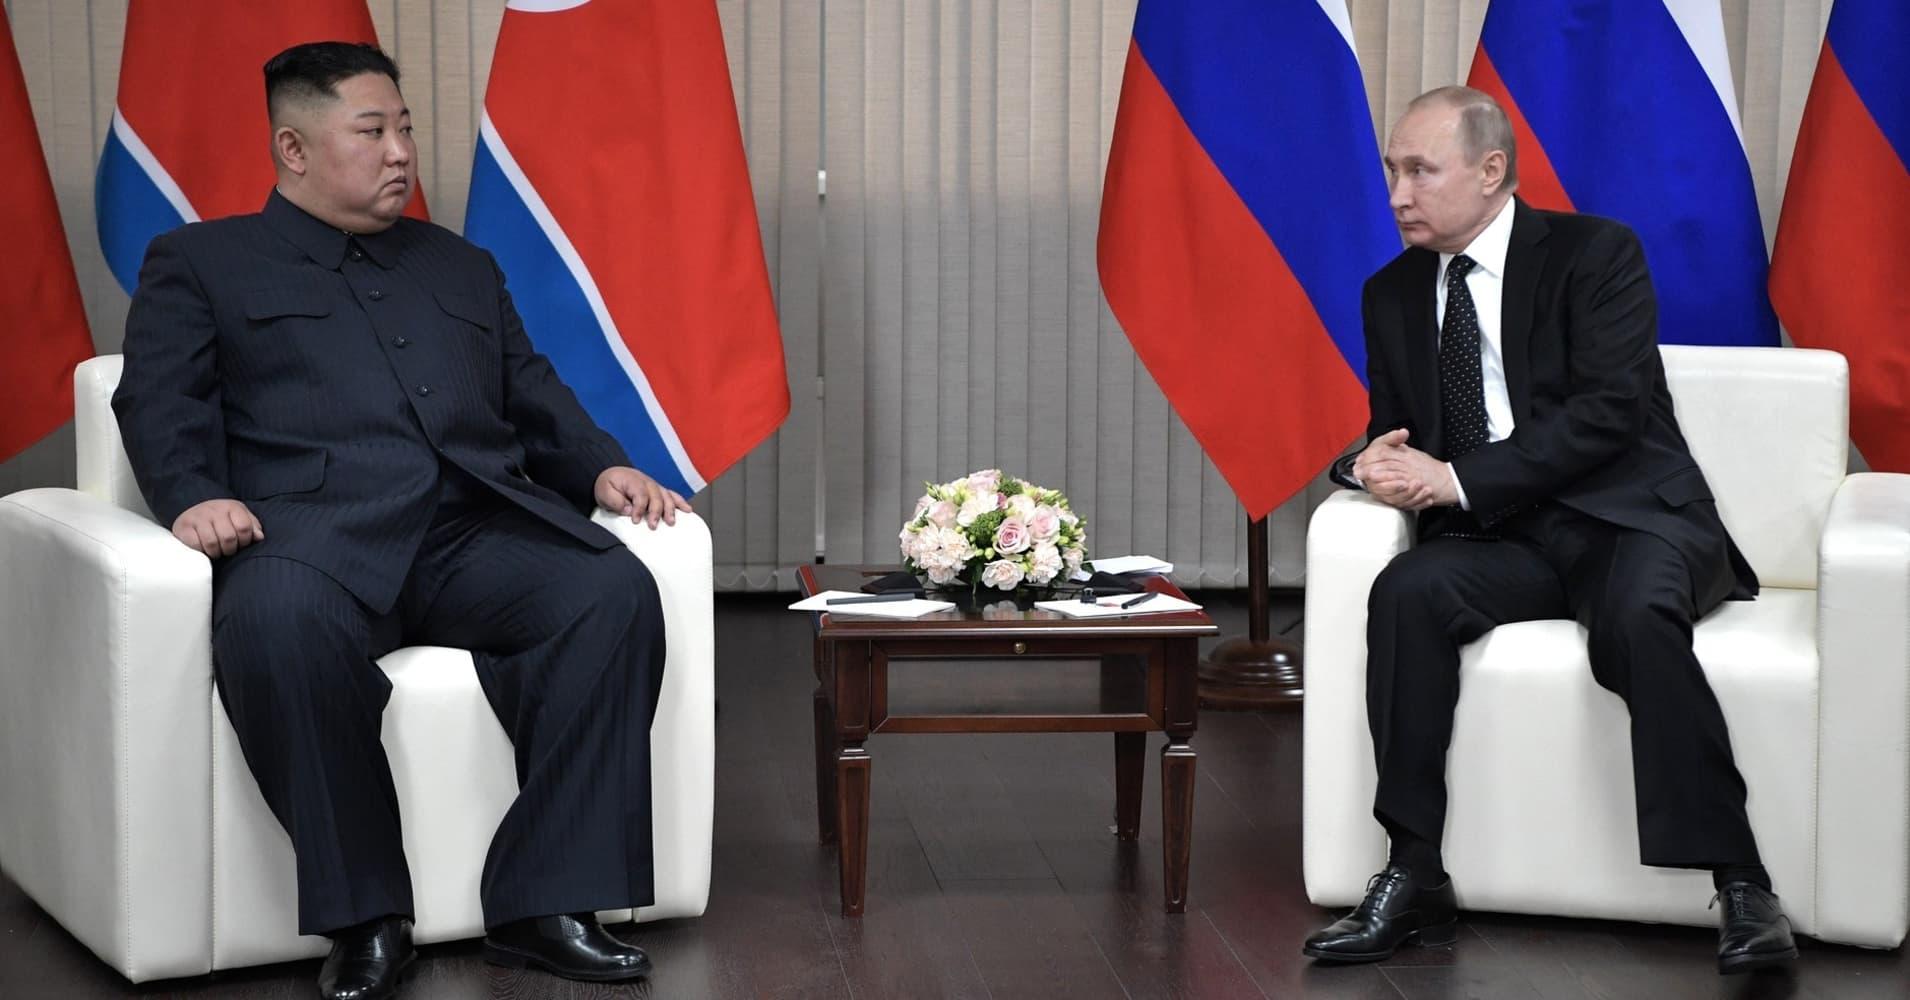 Putin has 'substantial' talks with Kim at summit